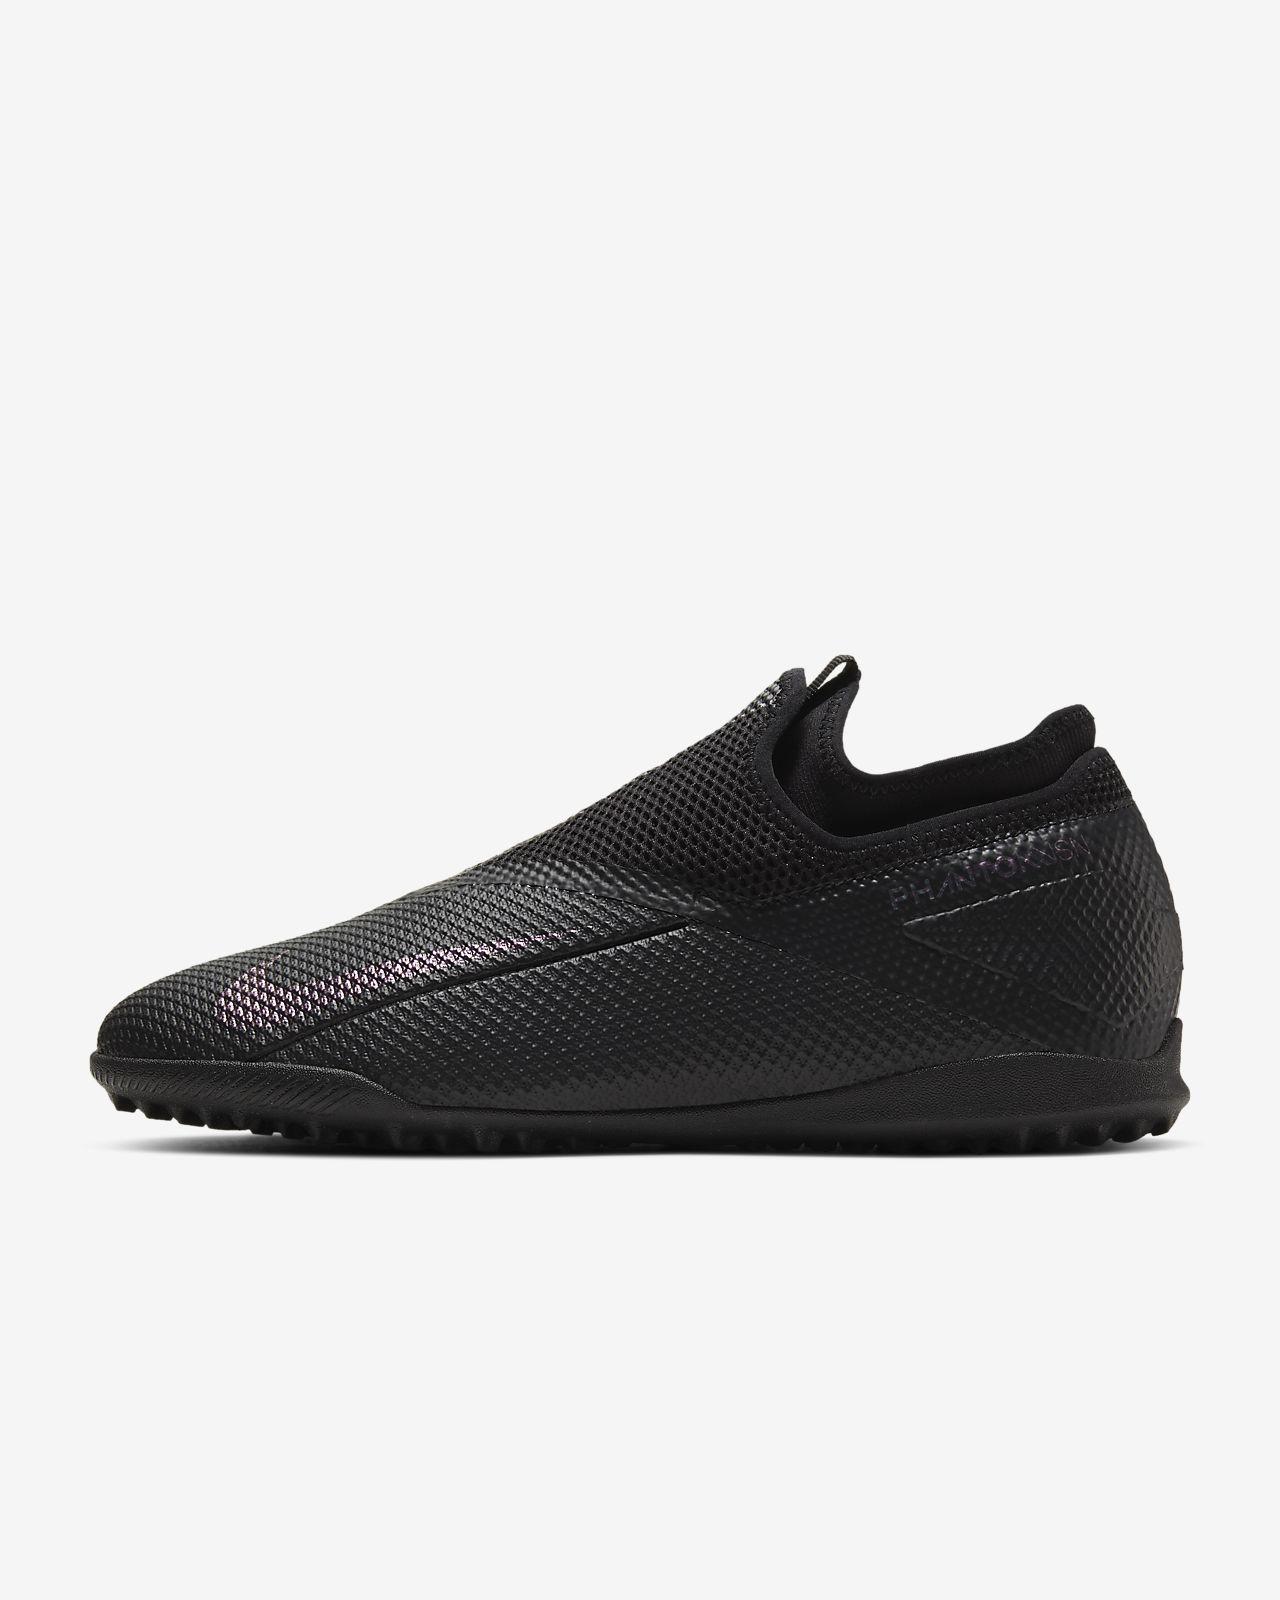 Nike Phantom Vision 2 Academy Dynamic Fit TF Artificial-Turf Soccer Shoe